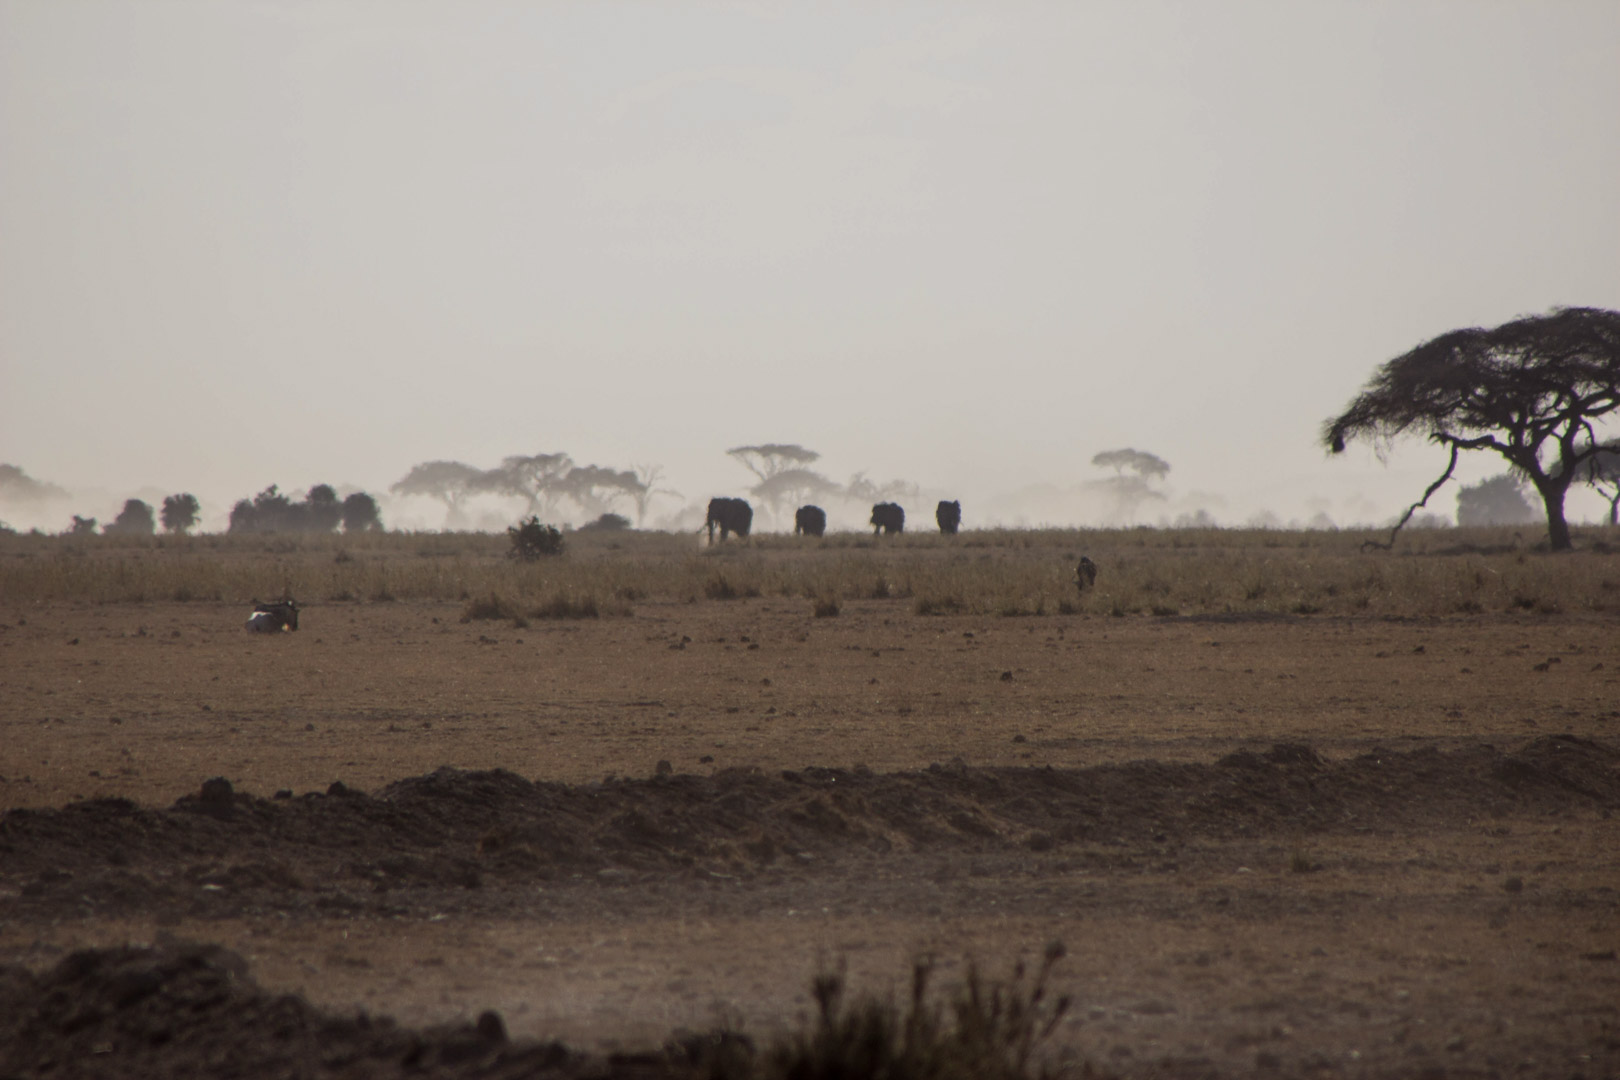 Primera manada de elefantes, Parque Nacional de Amboseli, Kenia